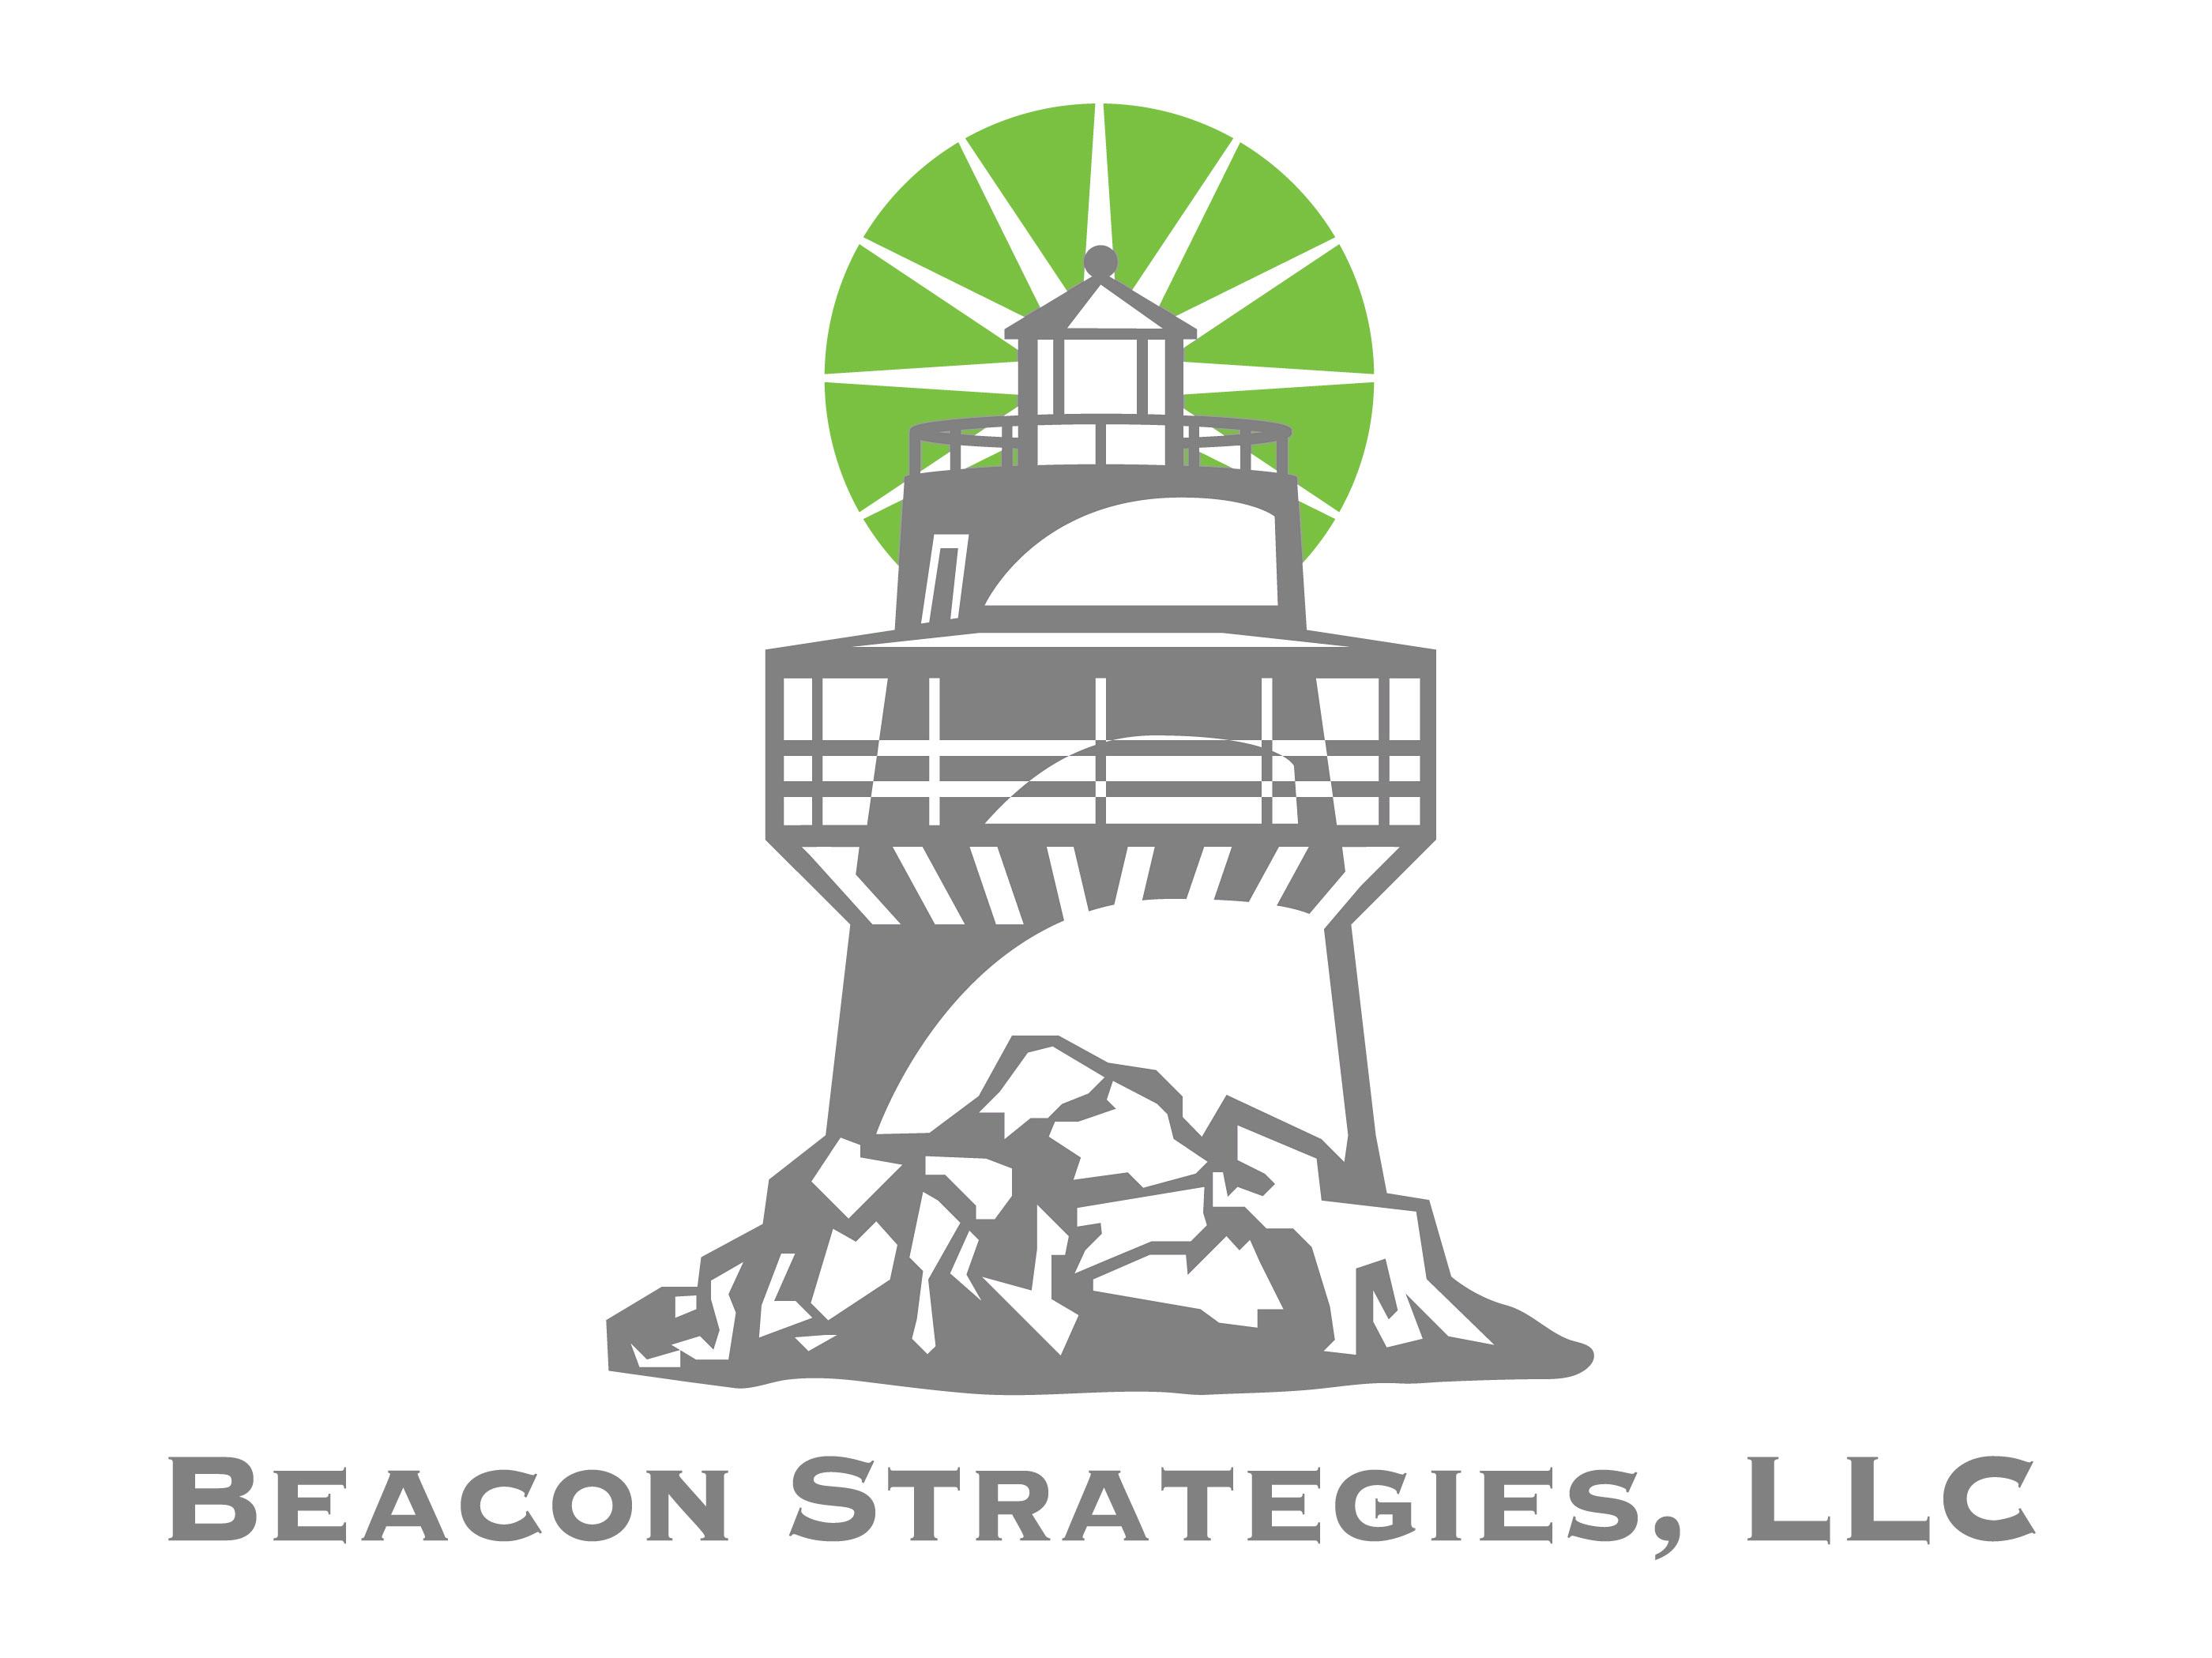 Beacon Strategies, LLC logo